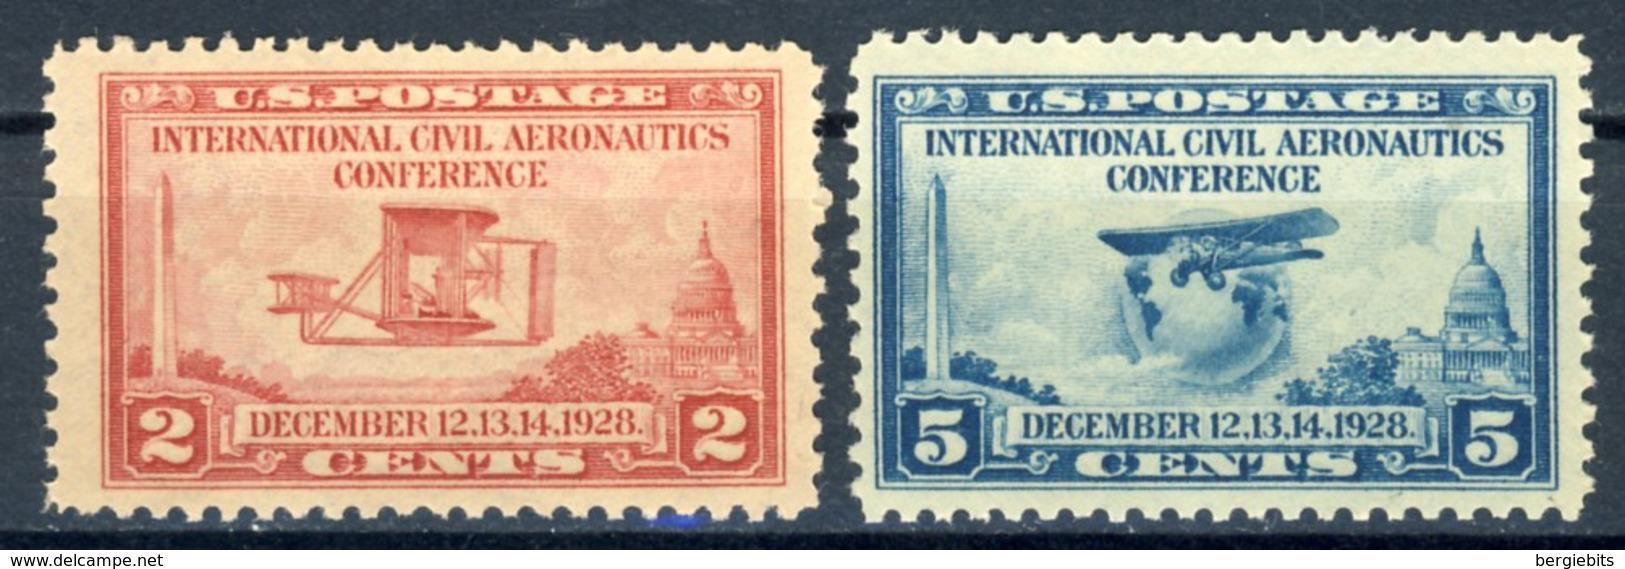 "1928 United Sates MNH OG Complete Set Of 2 Stamps ""Aeronautics Conference"" Cat. # 314-315 - Unused Stamps"